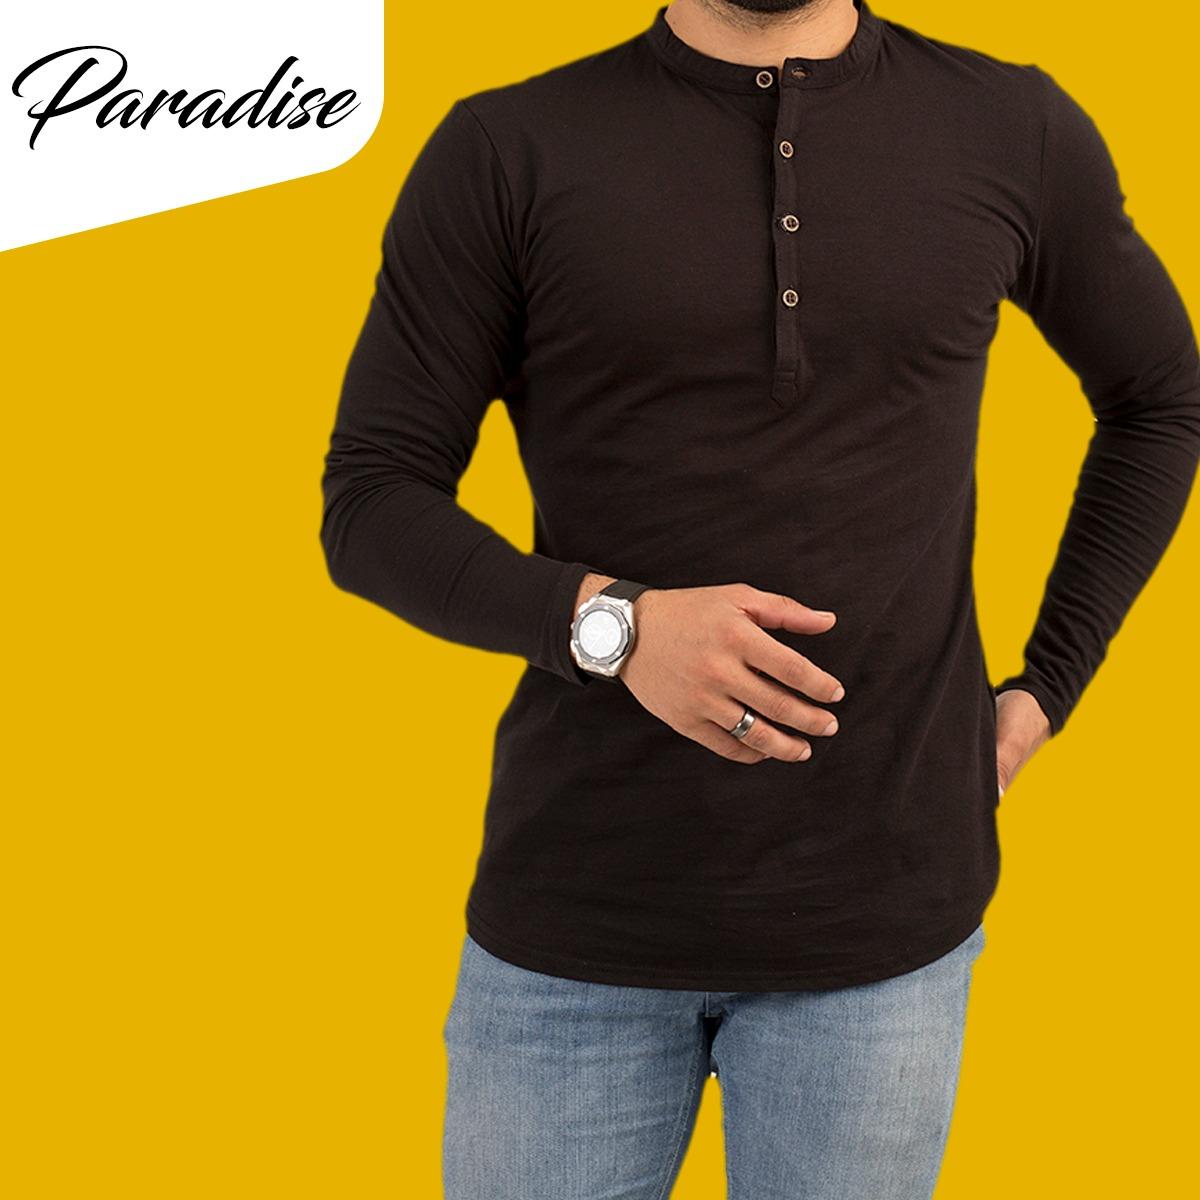 New Men's T-Shirts   Branded T-Shirts for Men in Pakistan - Daraz.pk